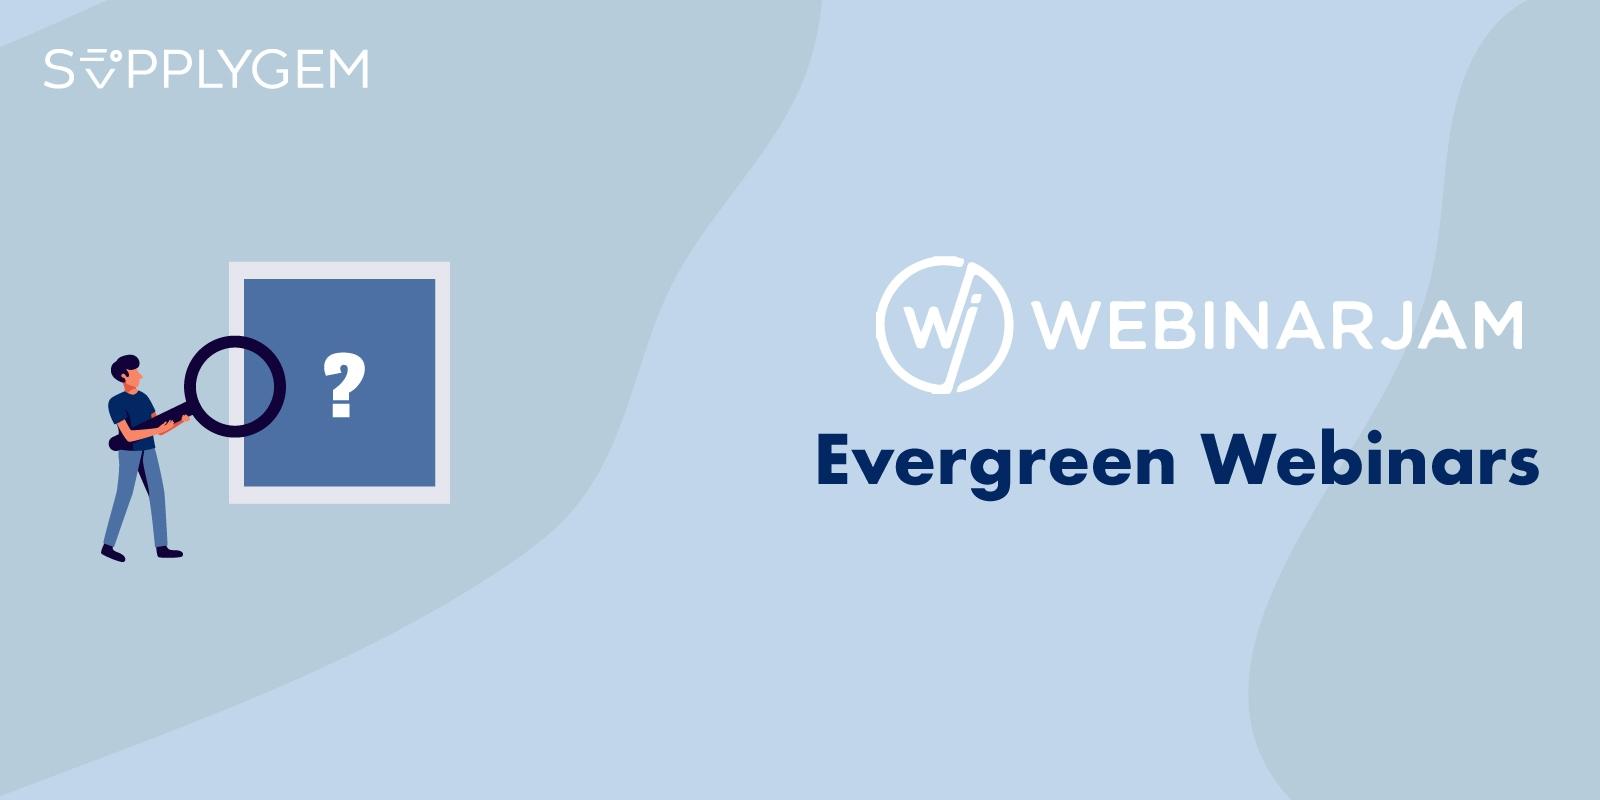 WebinarJam Evergreen